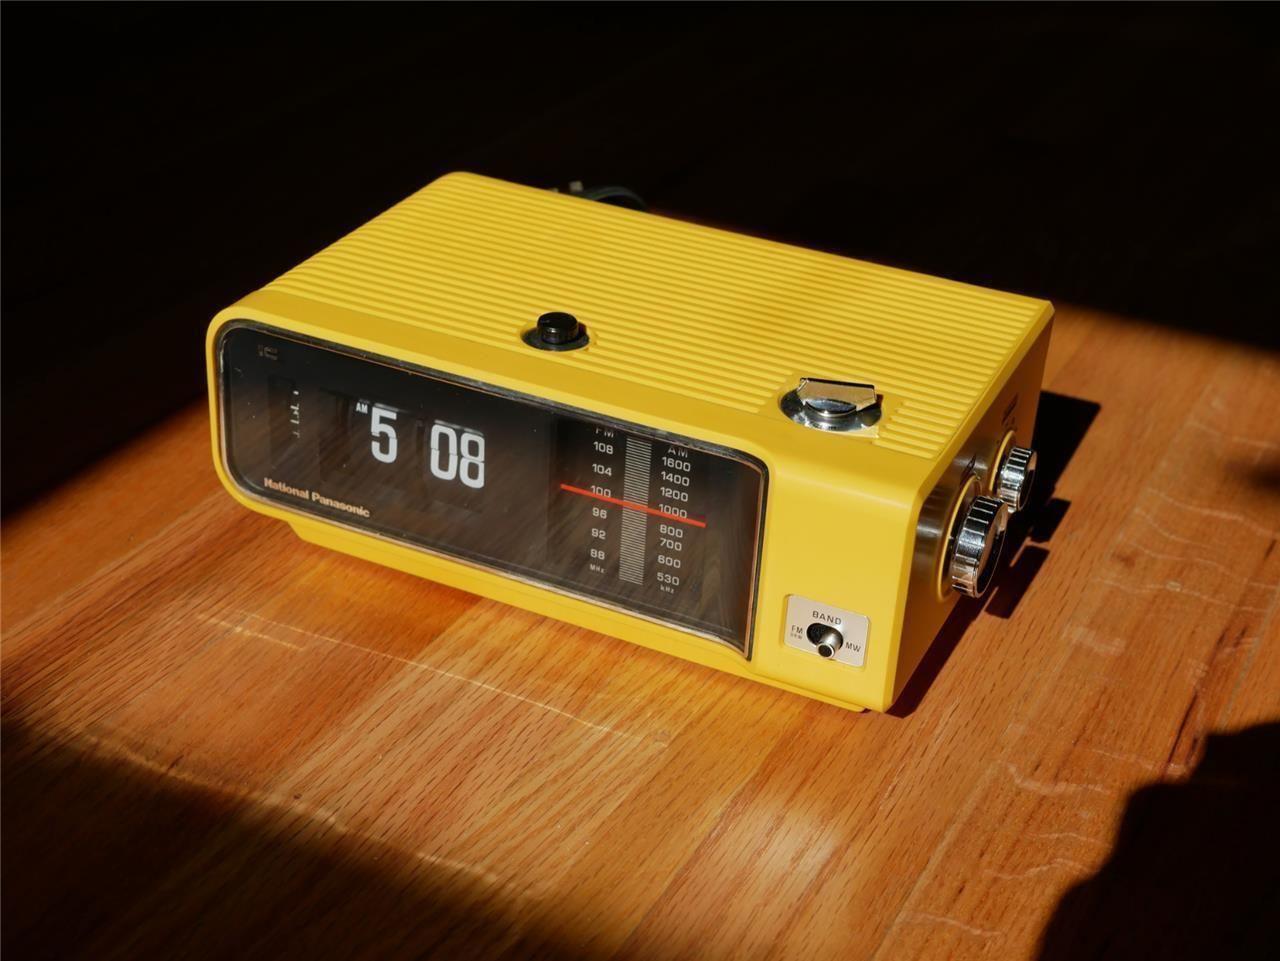 Pin On Telephones Clocks Radios